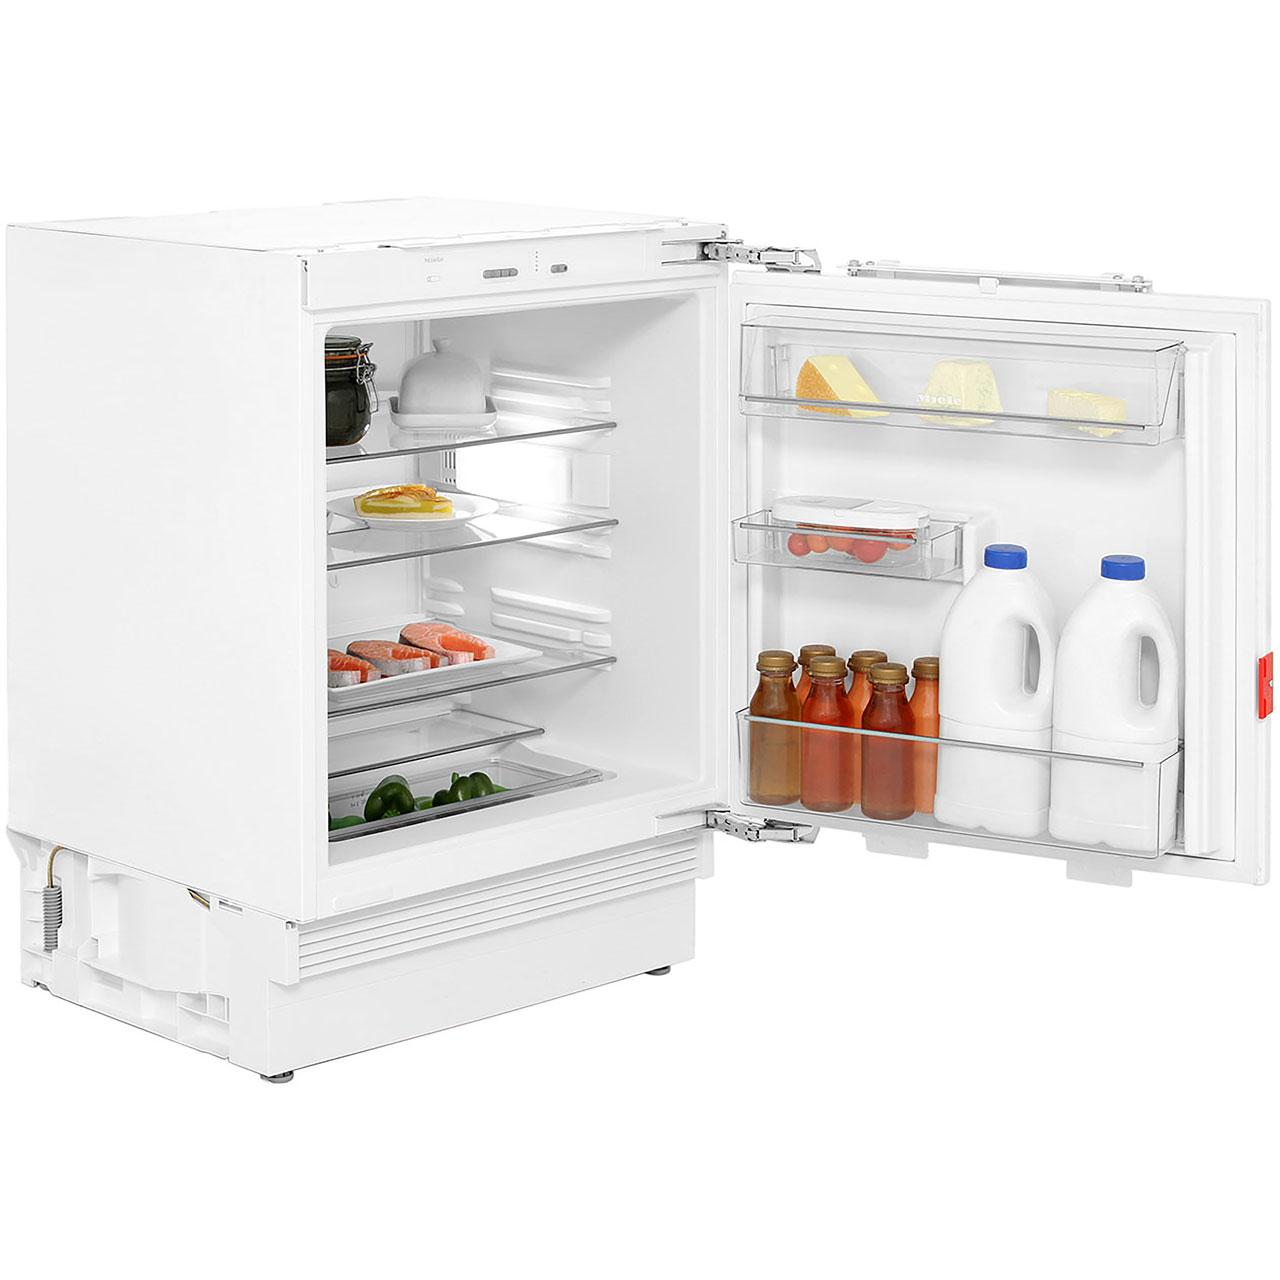 Miele Grand Froid 4 Door Refrigerator - Miele-grand-froid-4-door-refrigerator